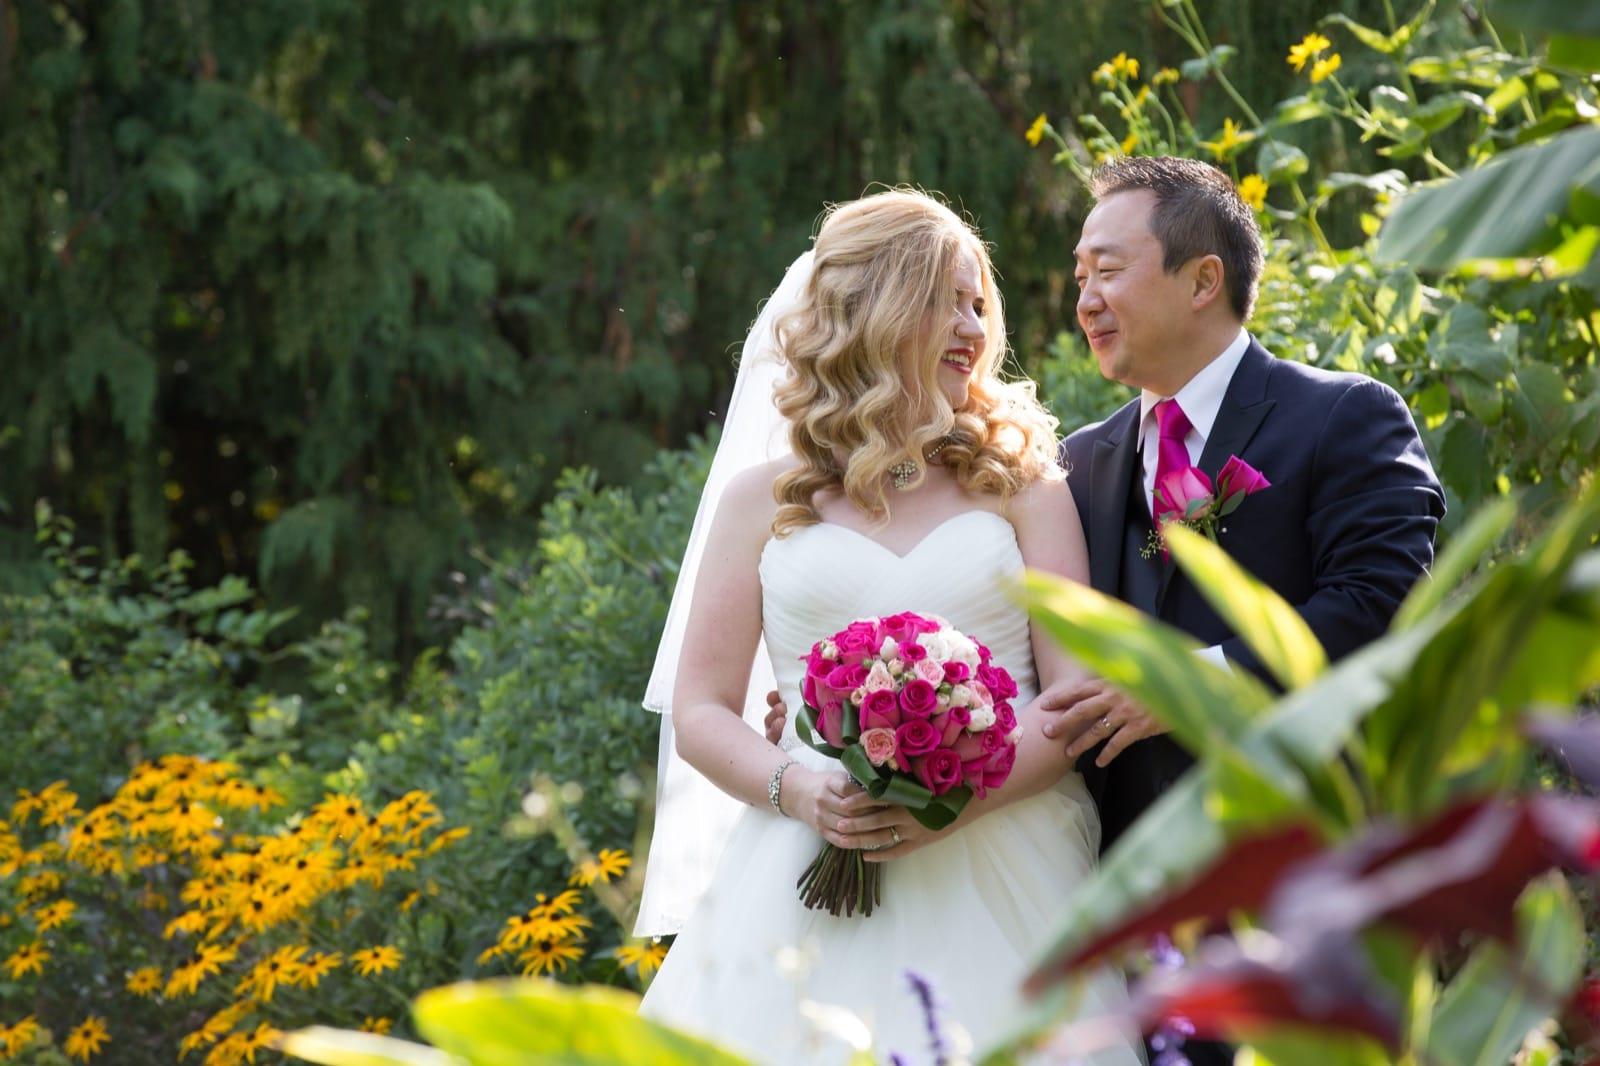 Toronto wedding photography - Dennis and Melissa